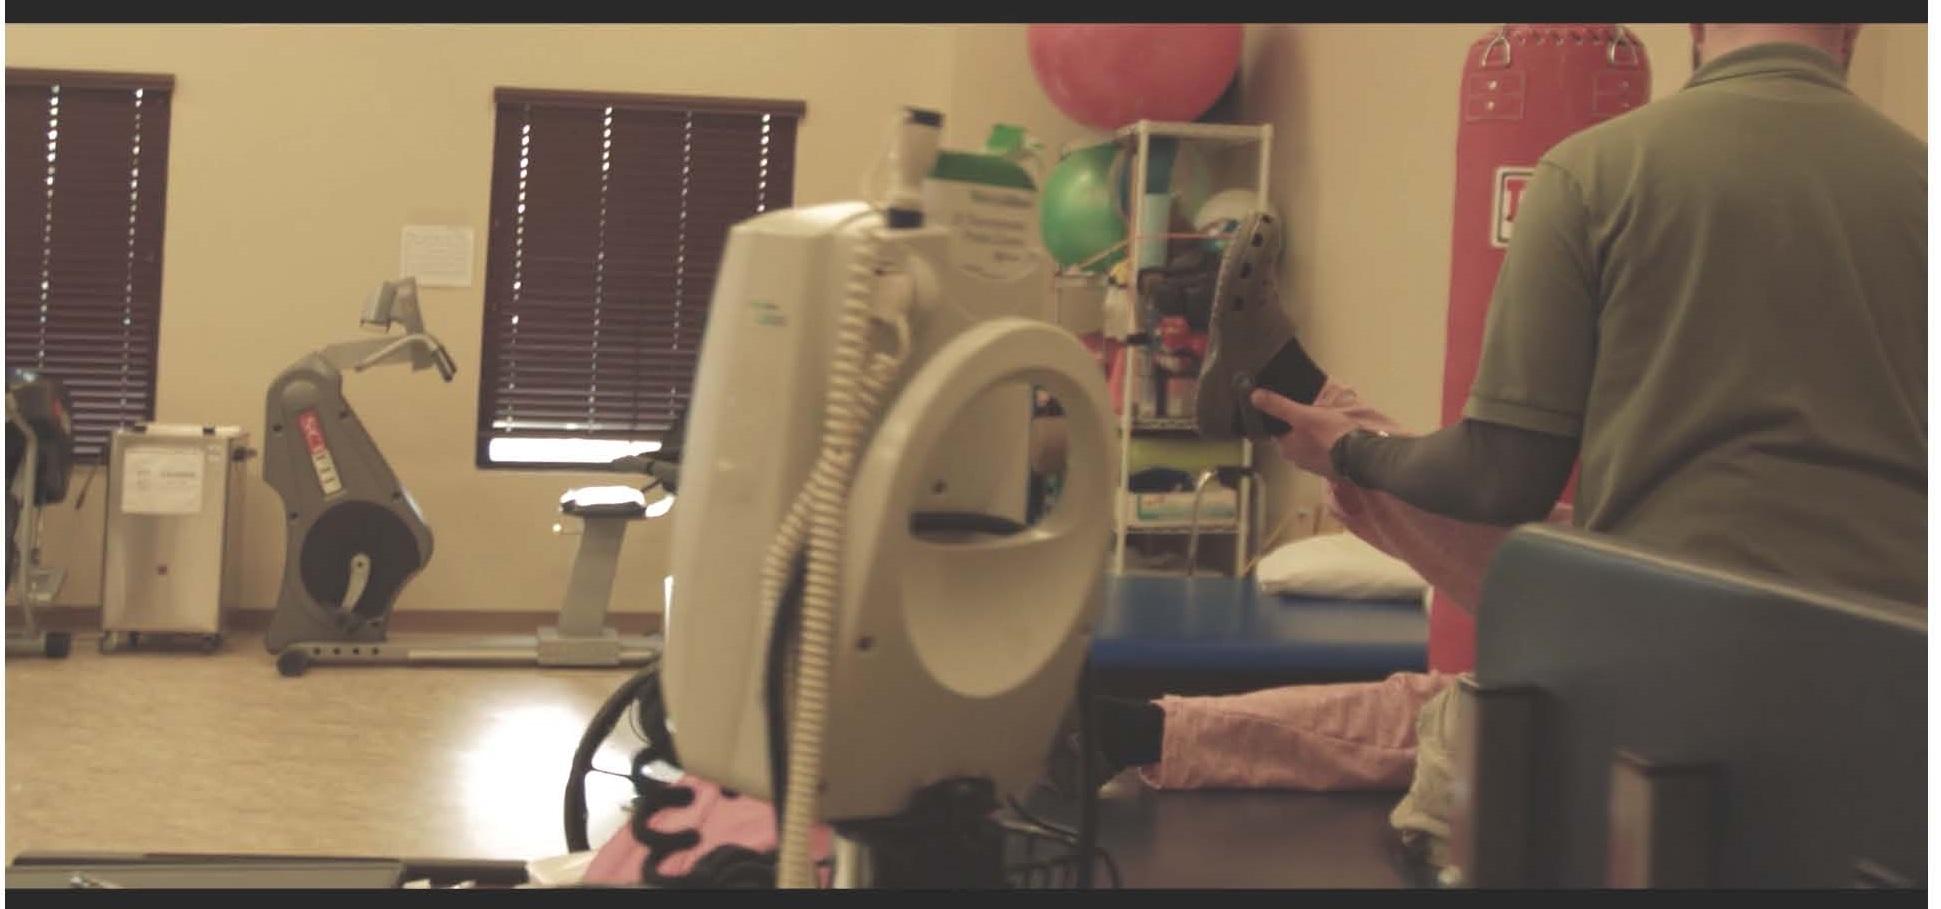 Mentis Neuro - El Paso Location Virtual Tour-HD on Vimeo6